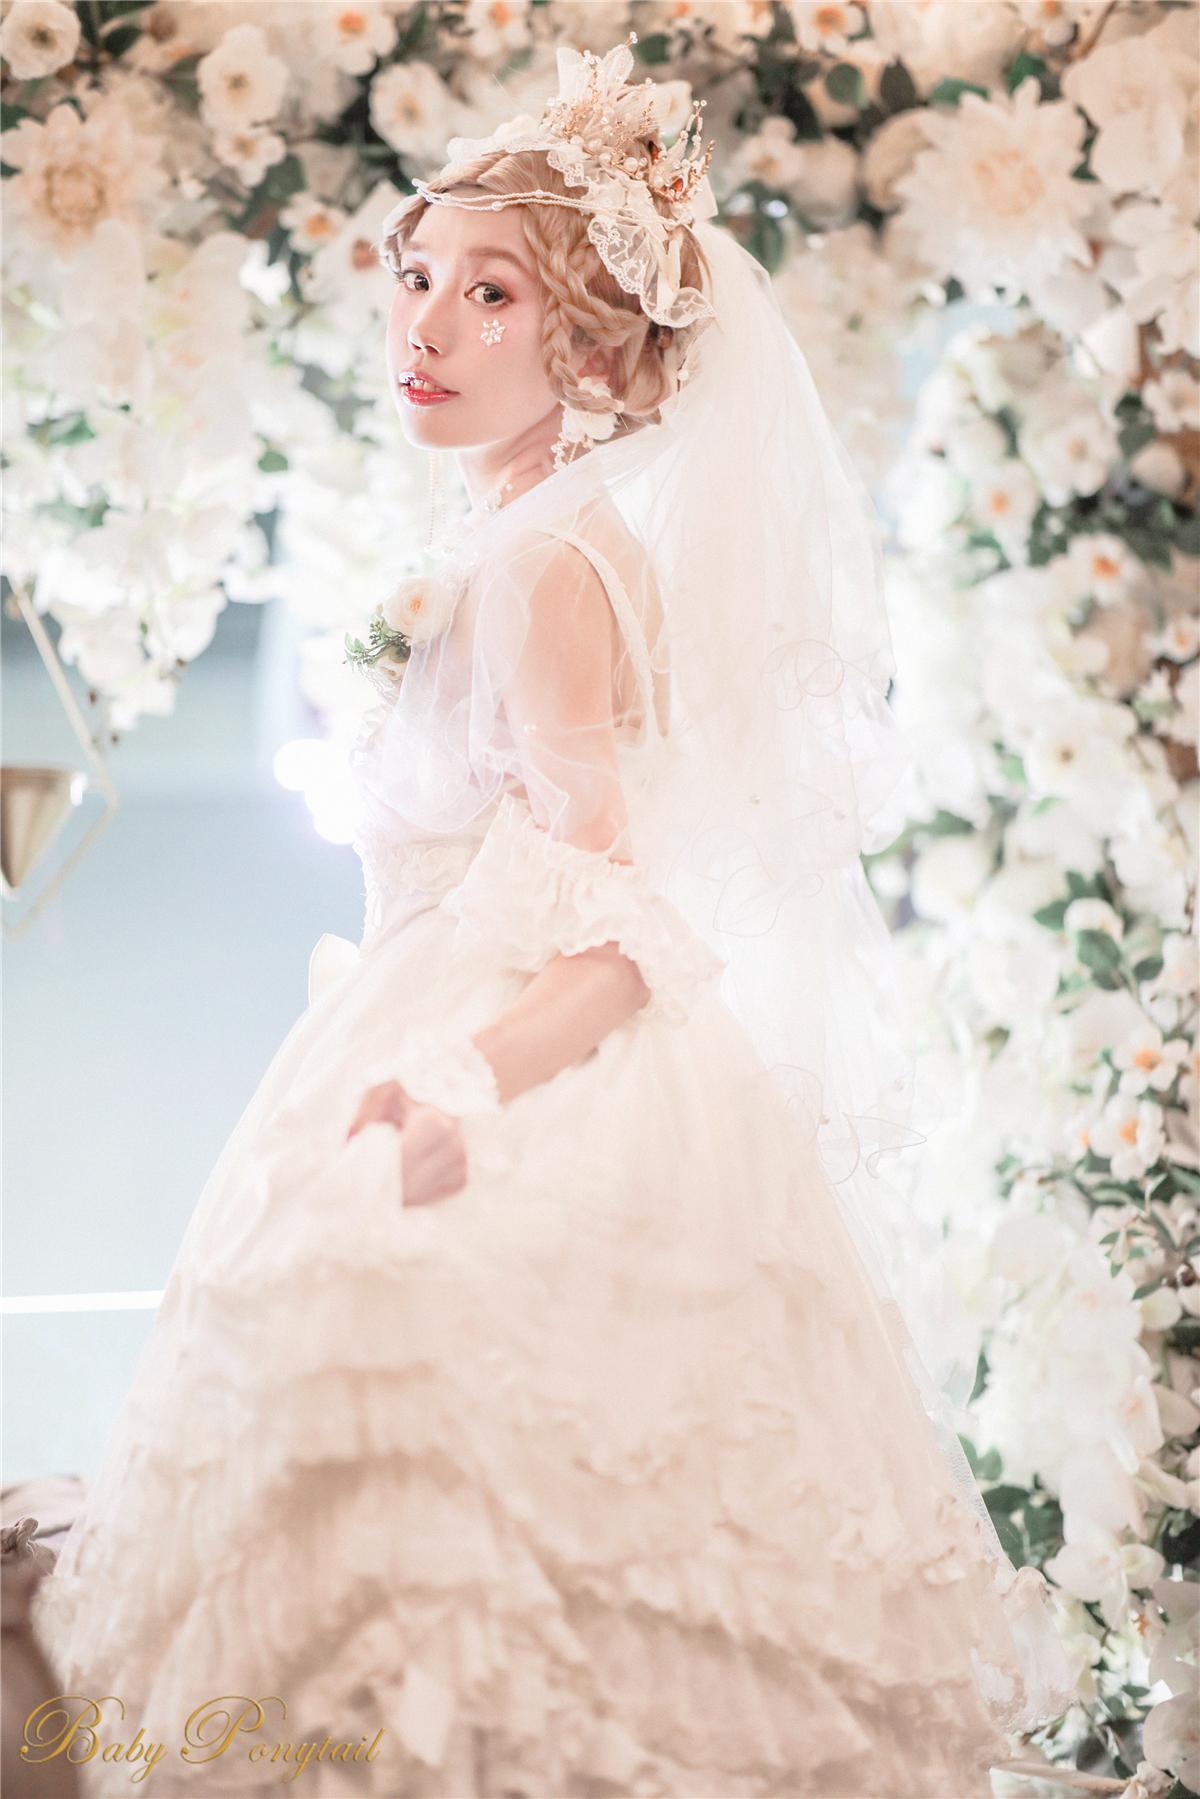 Babyponytail_Heavenly Teardrops_Model photo_JSK white_kaka_06.jpg